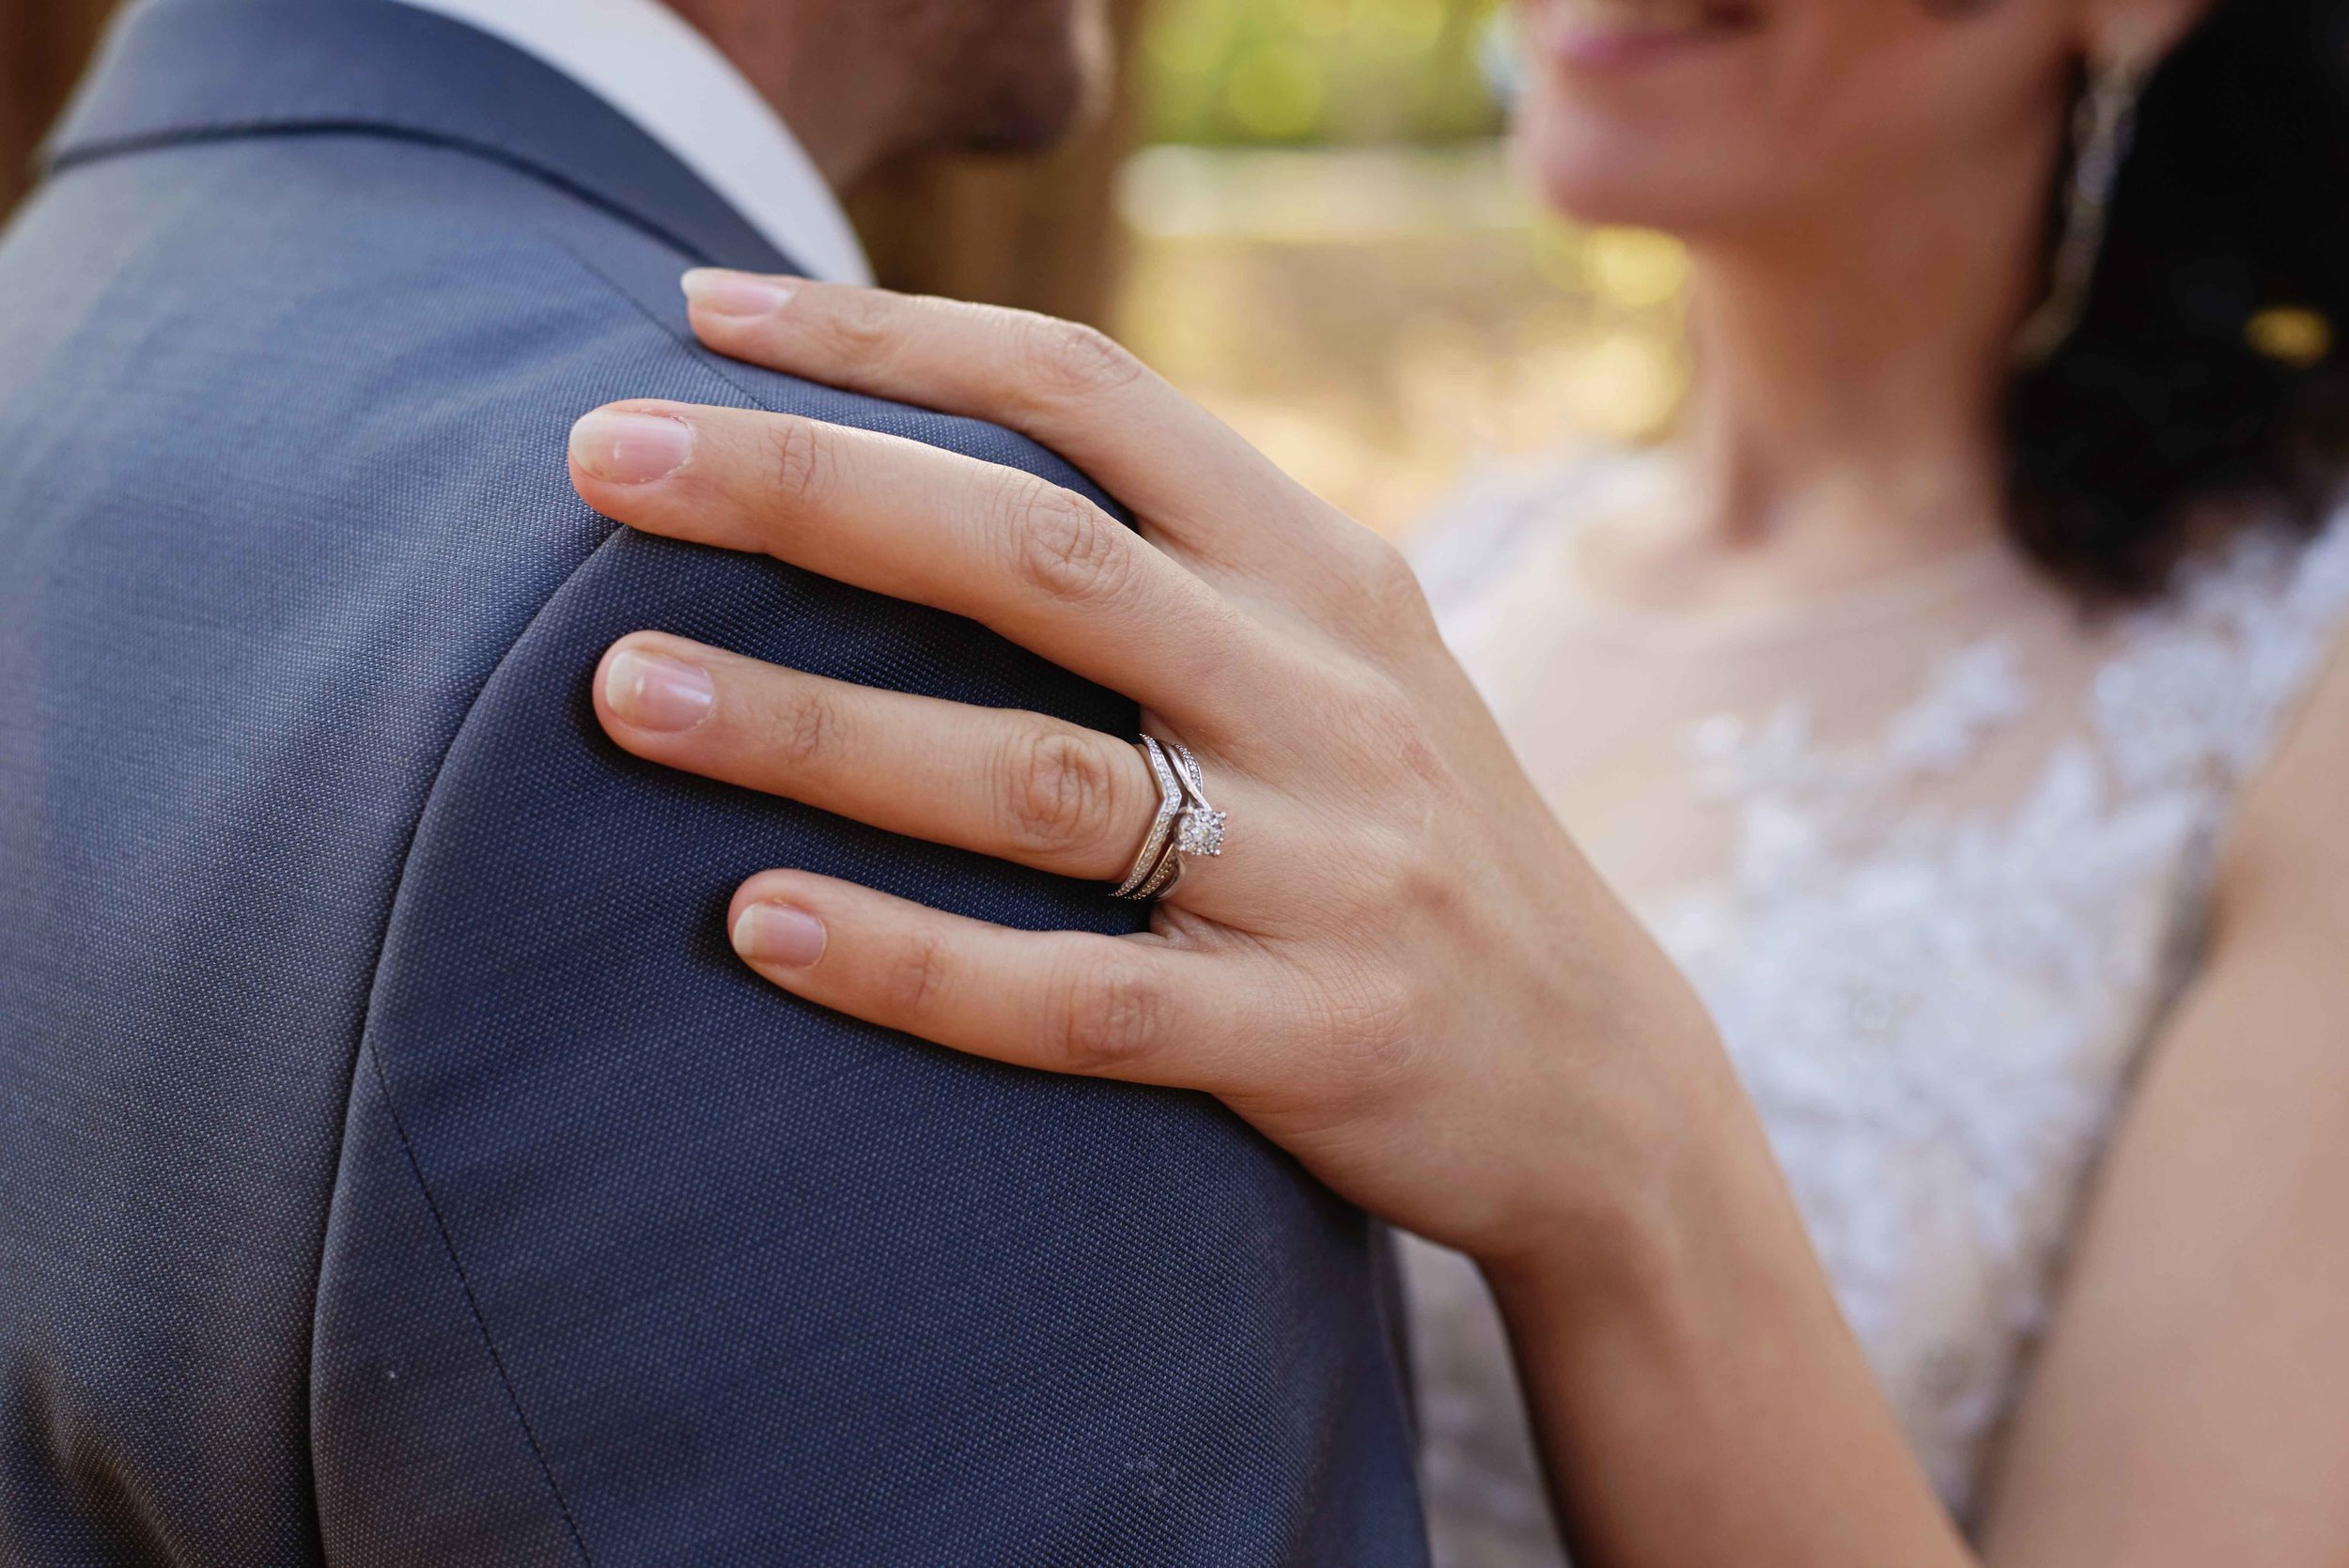 sorrento-wedding-photography-all-smiles-marissa-jade-photography-146.jpg